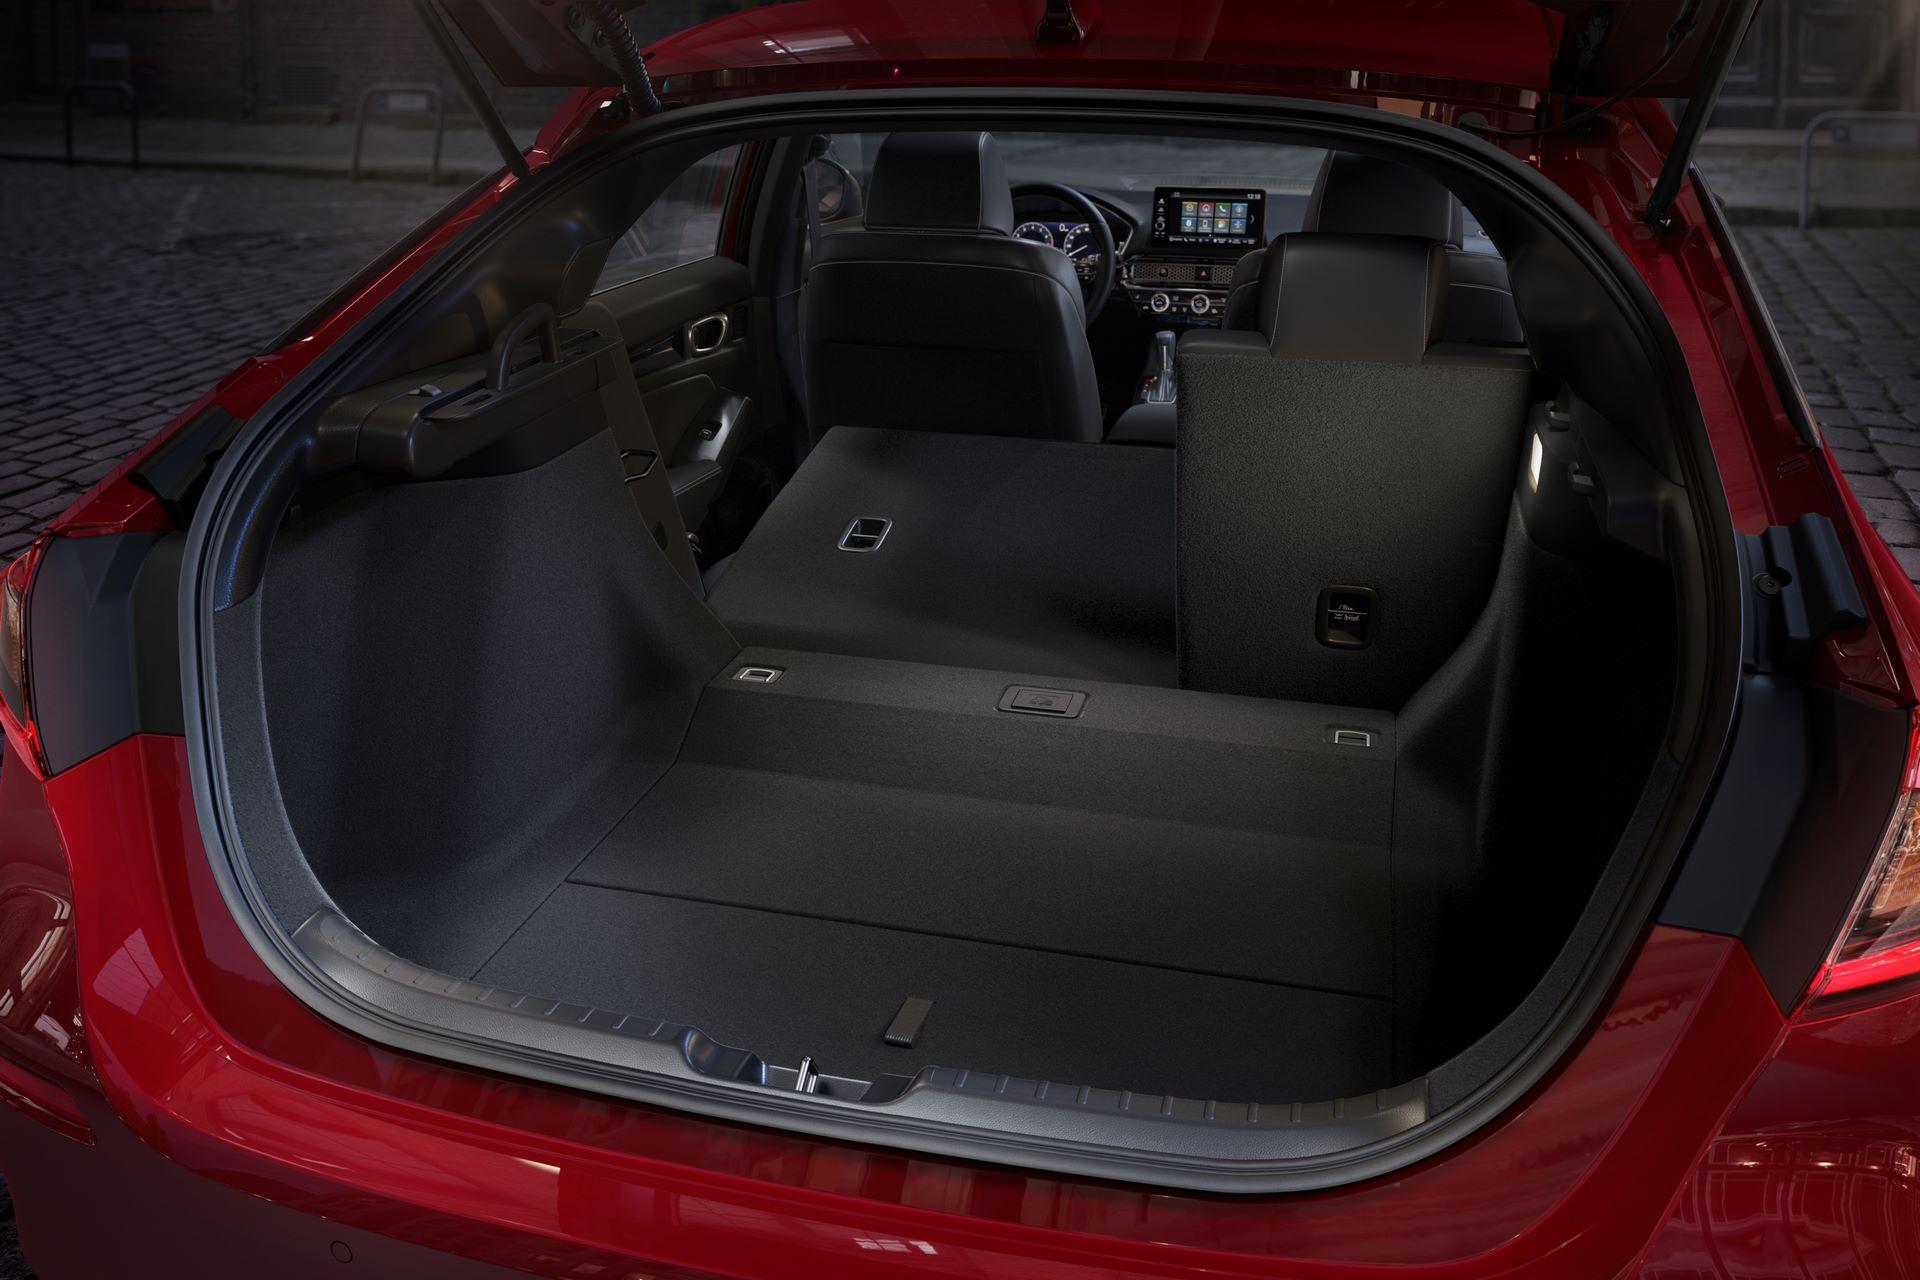 Honda-Civic-hatchback-8